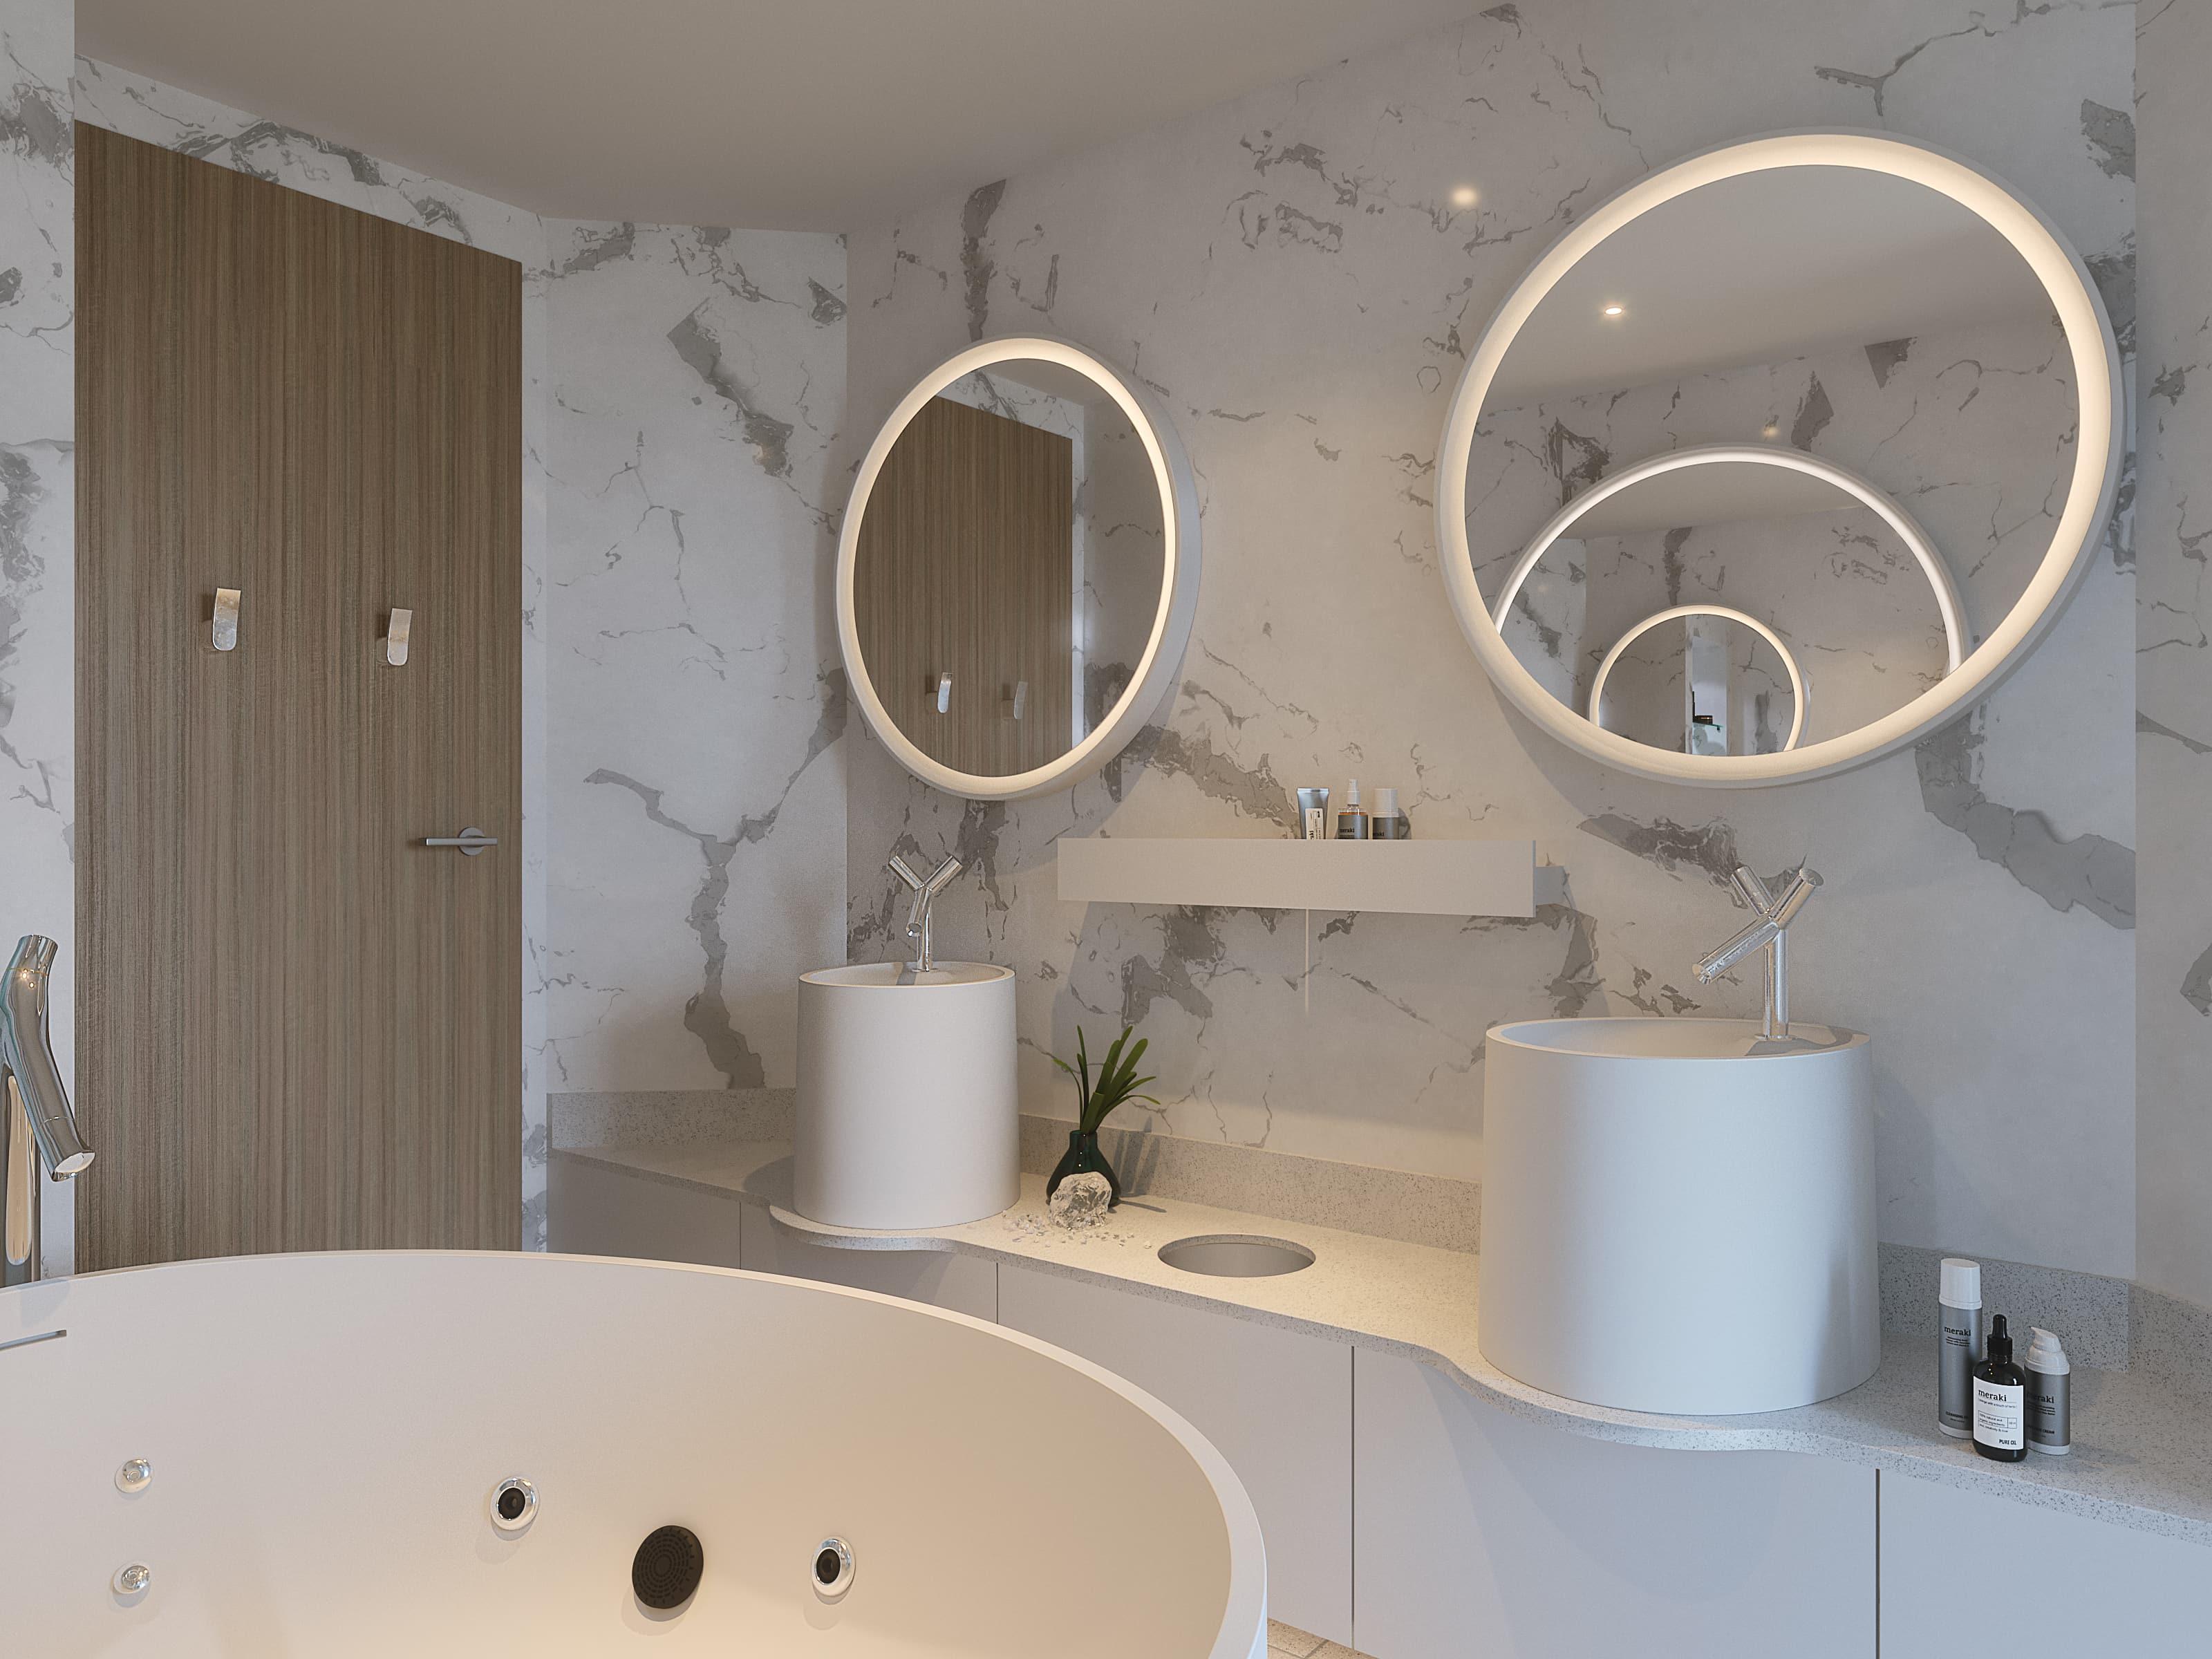 Bringing modern design to cruise ship bathrooms